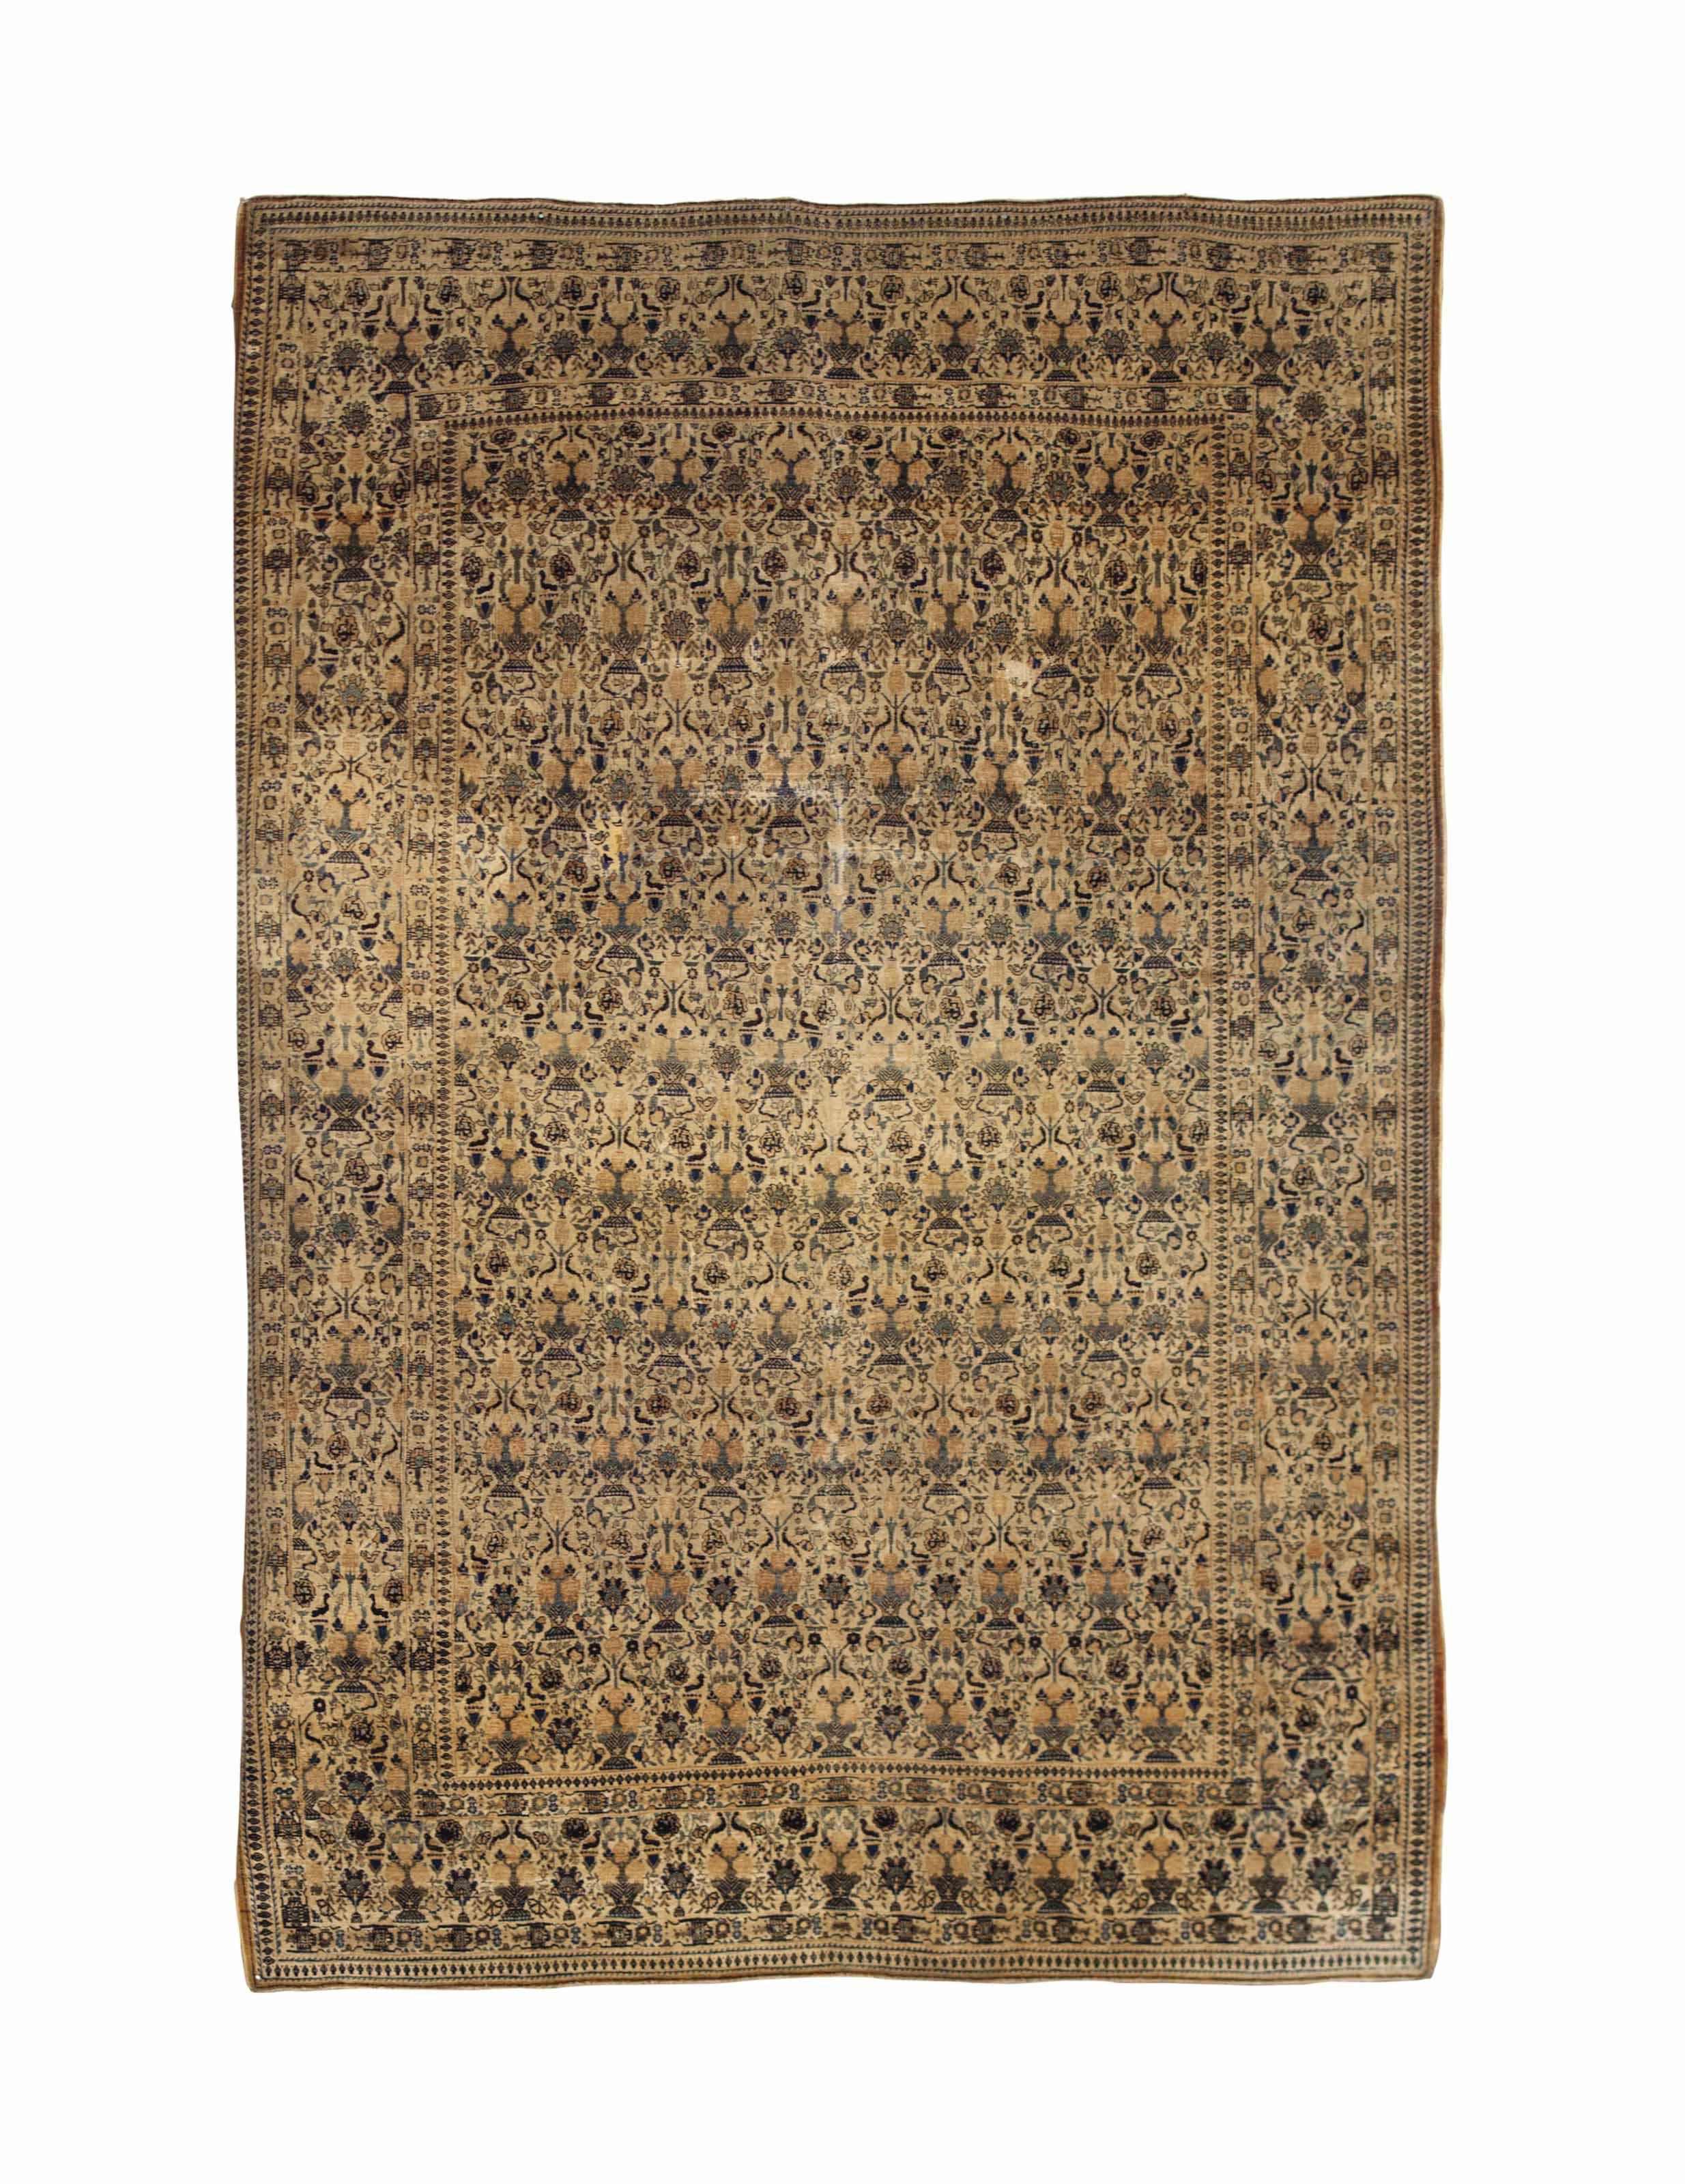 A TEHRAN CARPET,